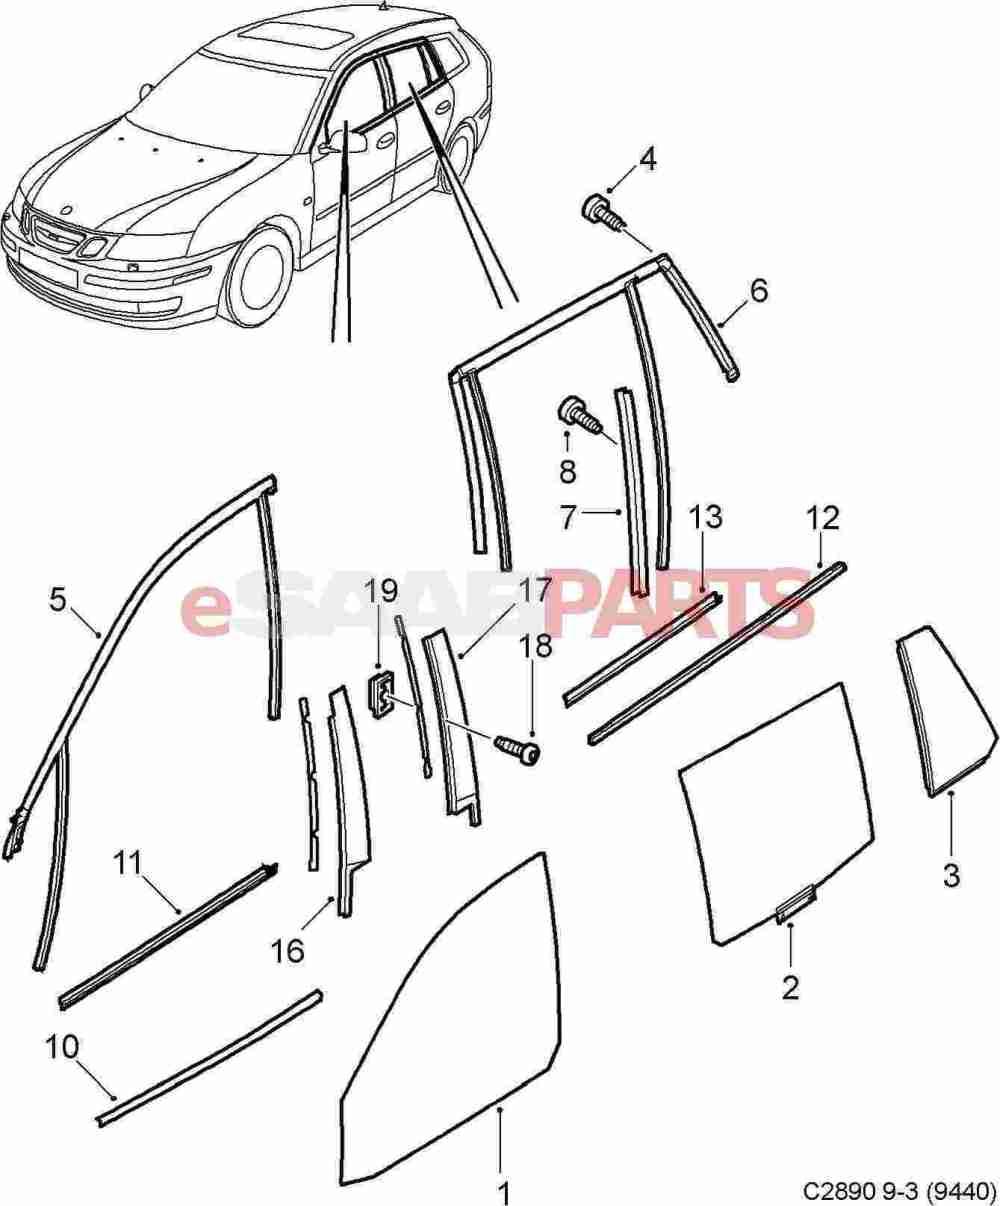 medium resolution of car window diagram wiring diagram operations car power window schematic diagram car window diagram